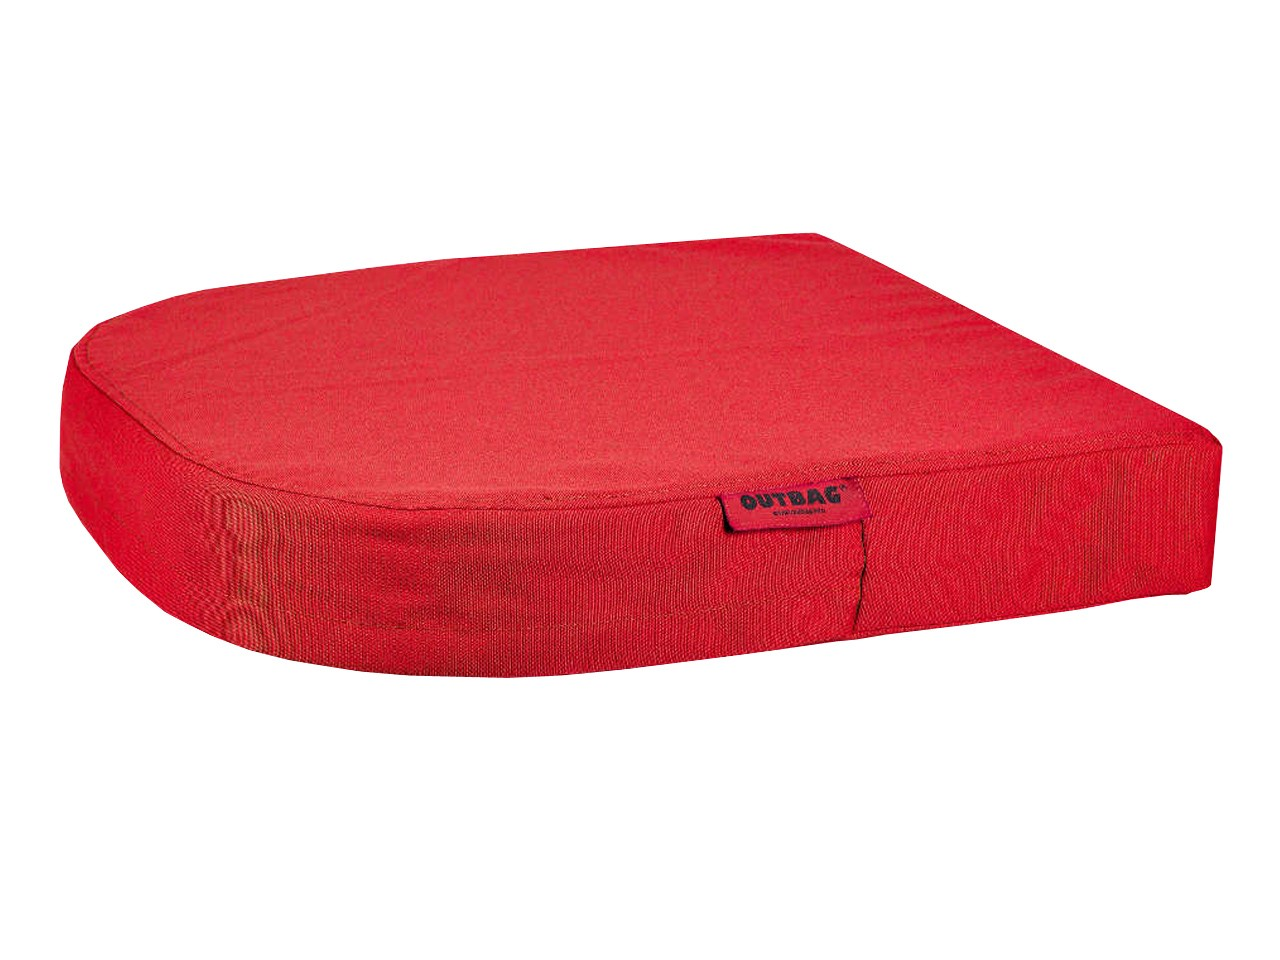 Outbag Sitzauflage Stuhlauflage Moon 31MOPLU-RED plus red